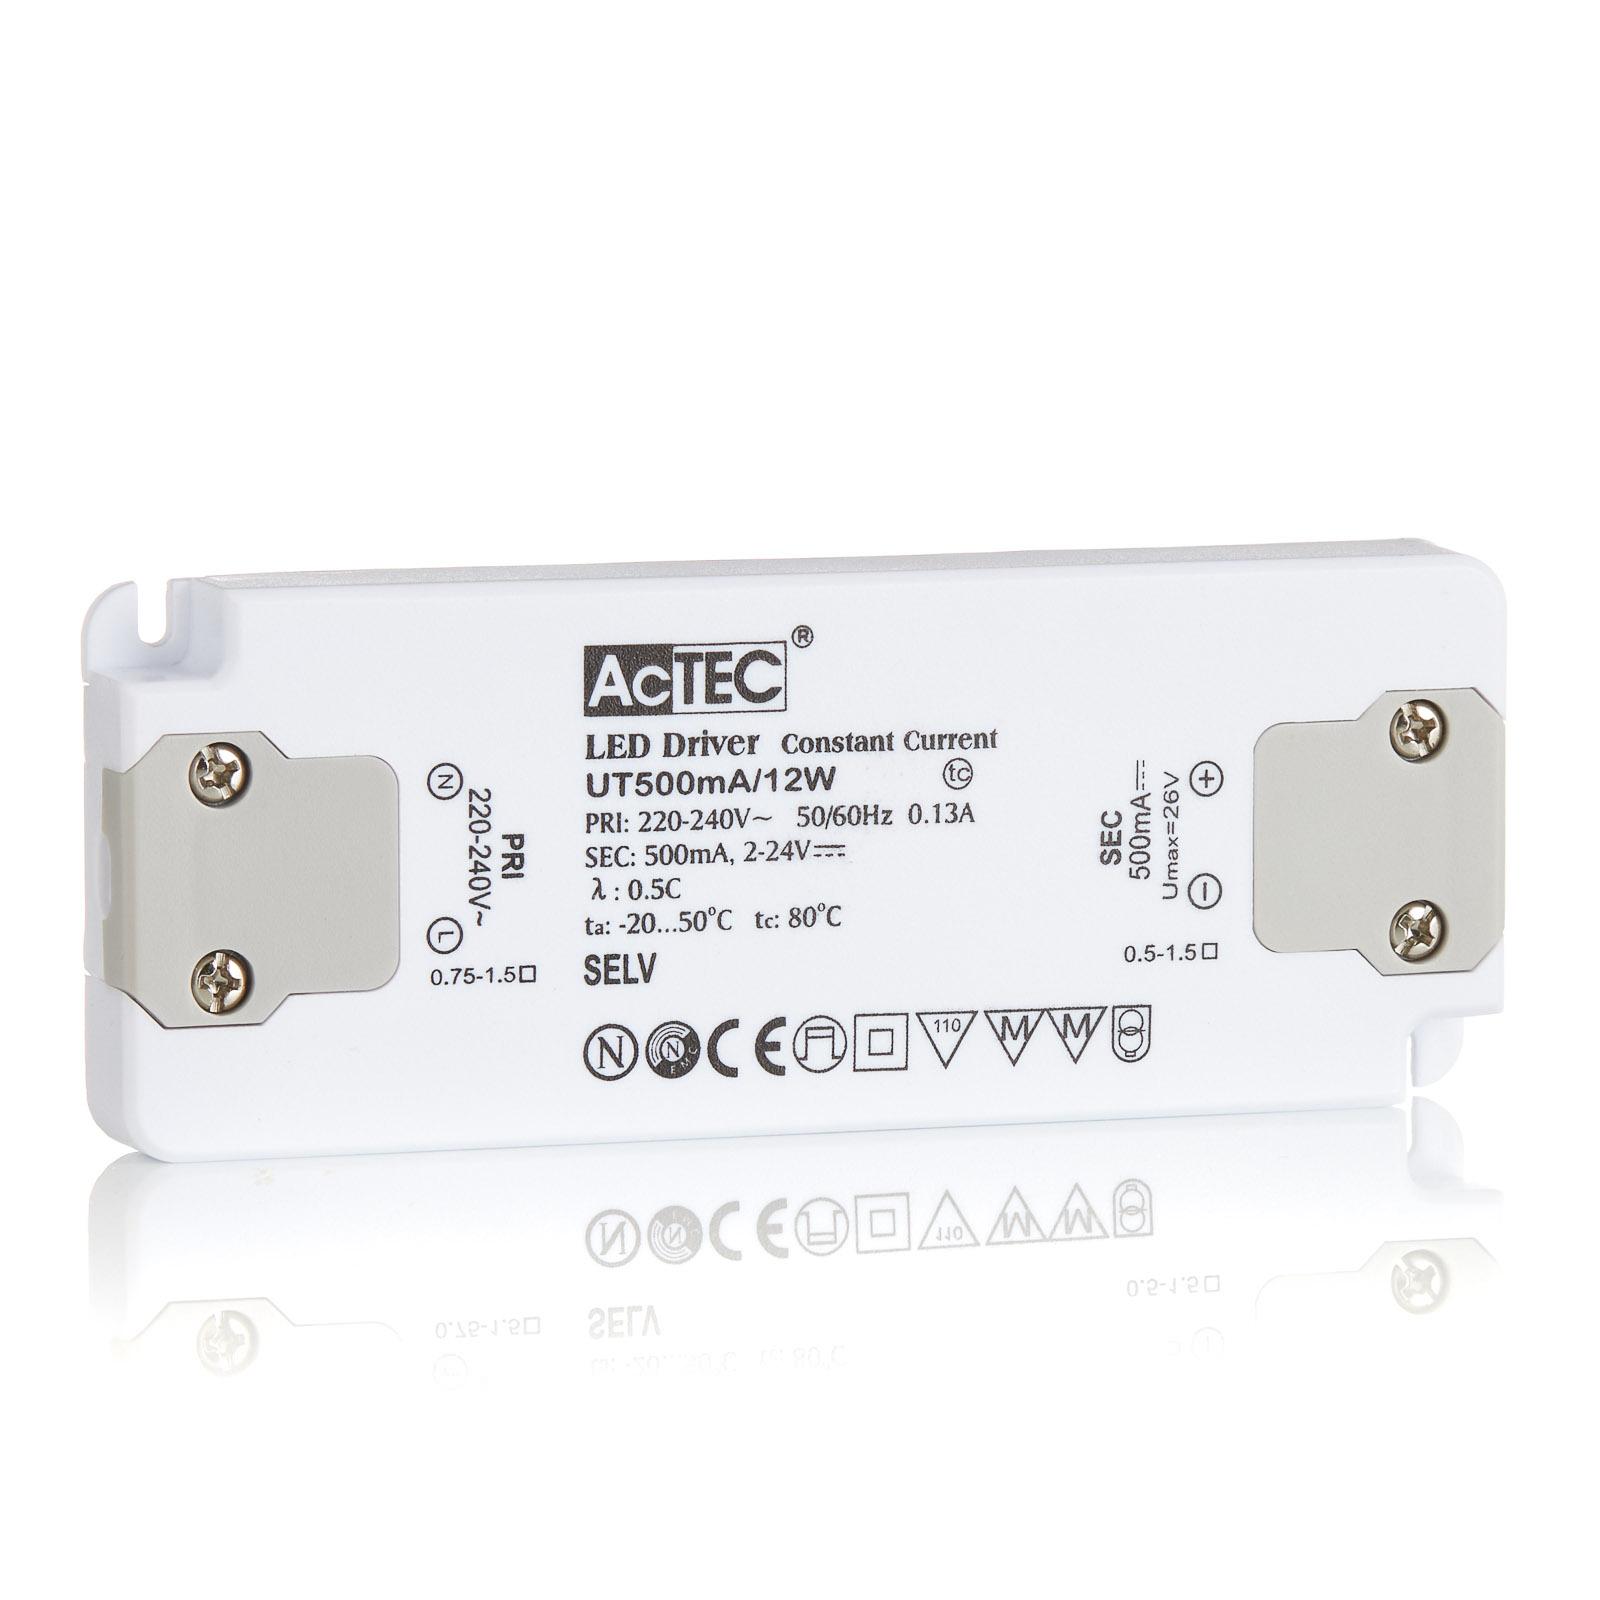 AcTEC Slim LED-Treiber CC 500mA, 12W